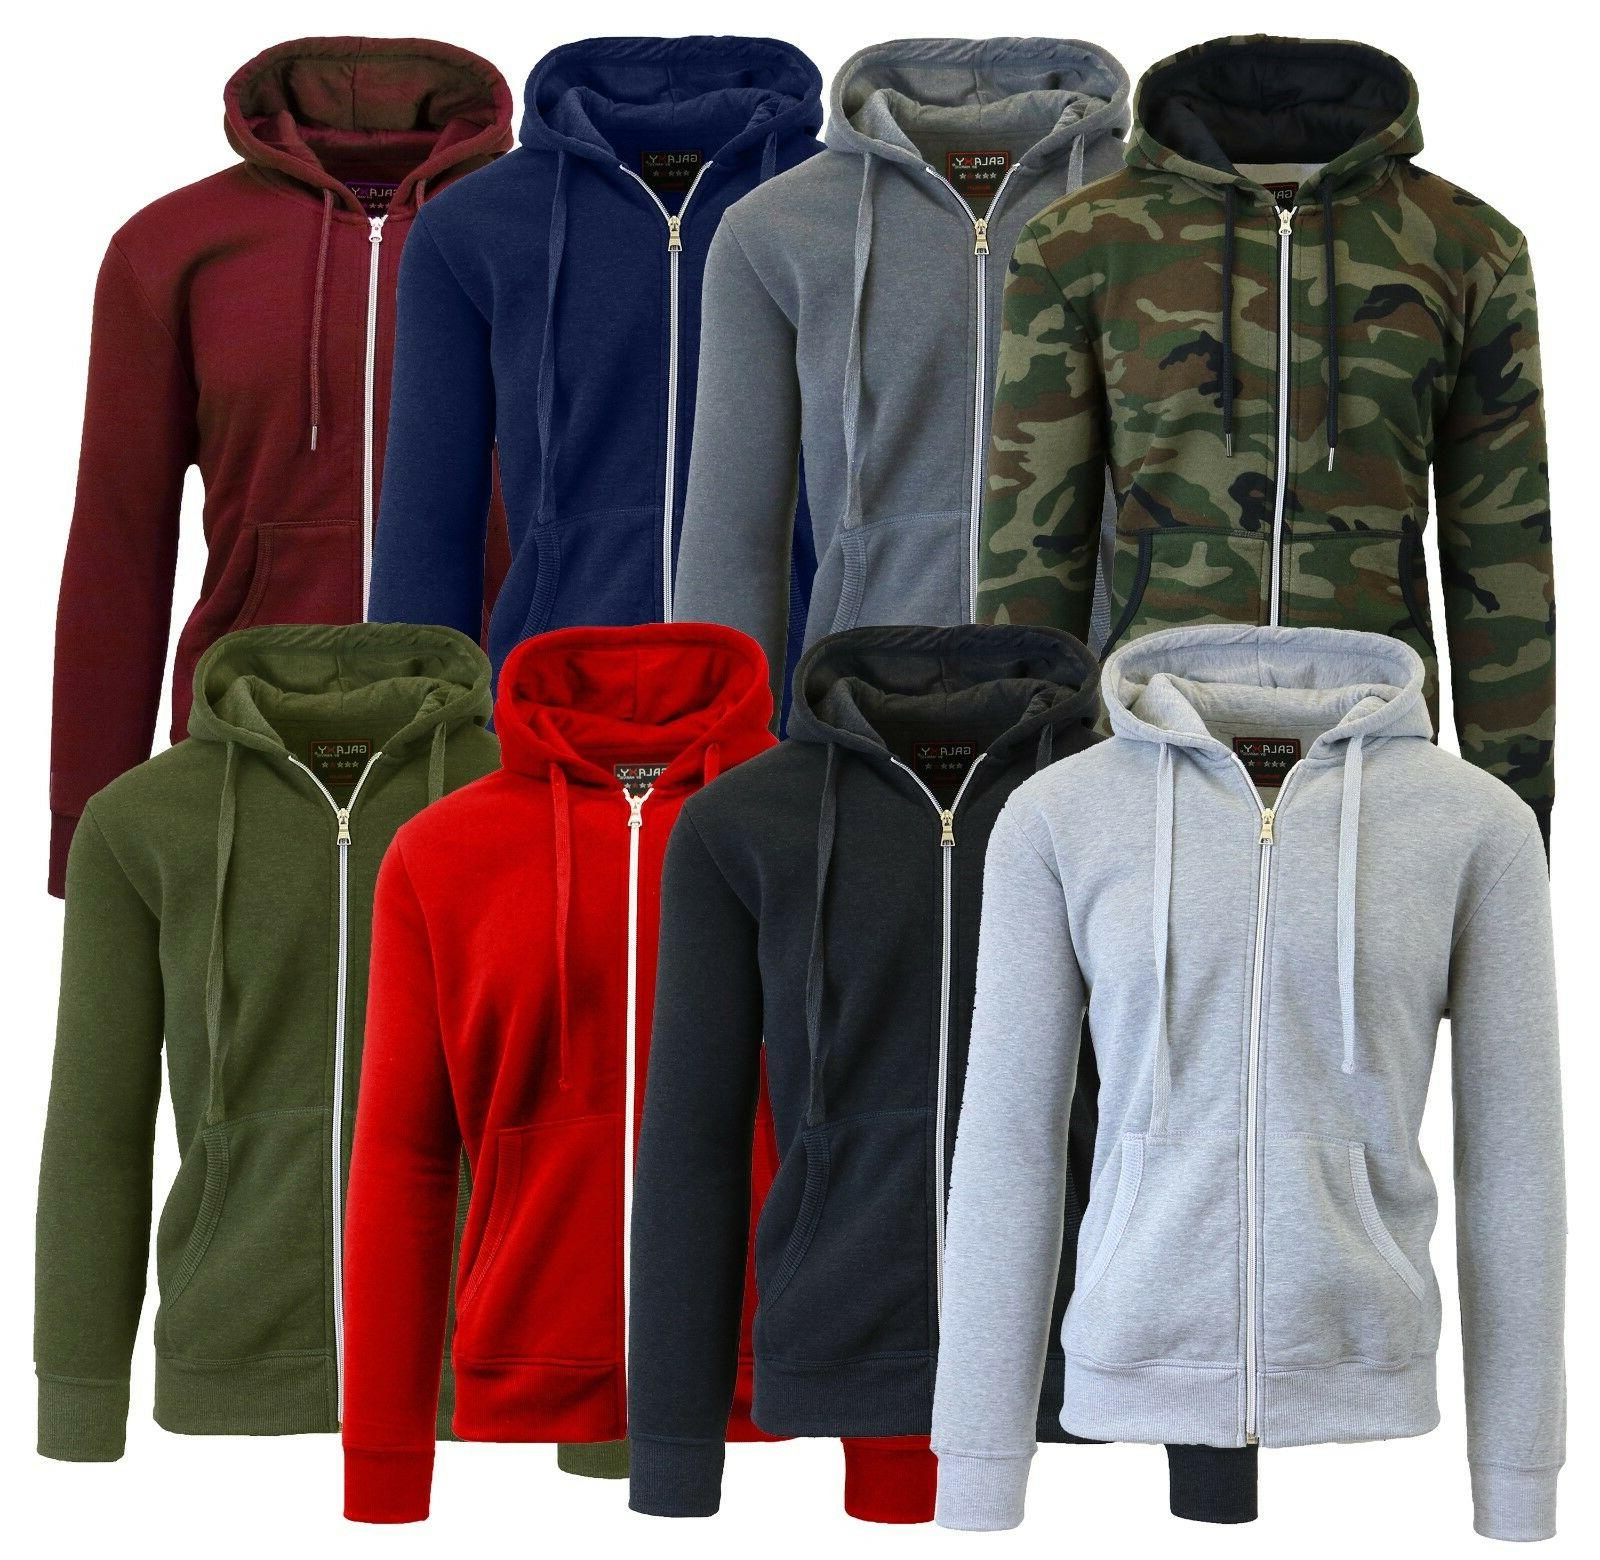 mens fleece hoodie jacket sweater for layering